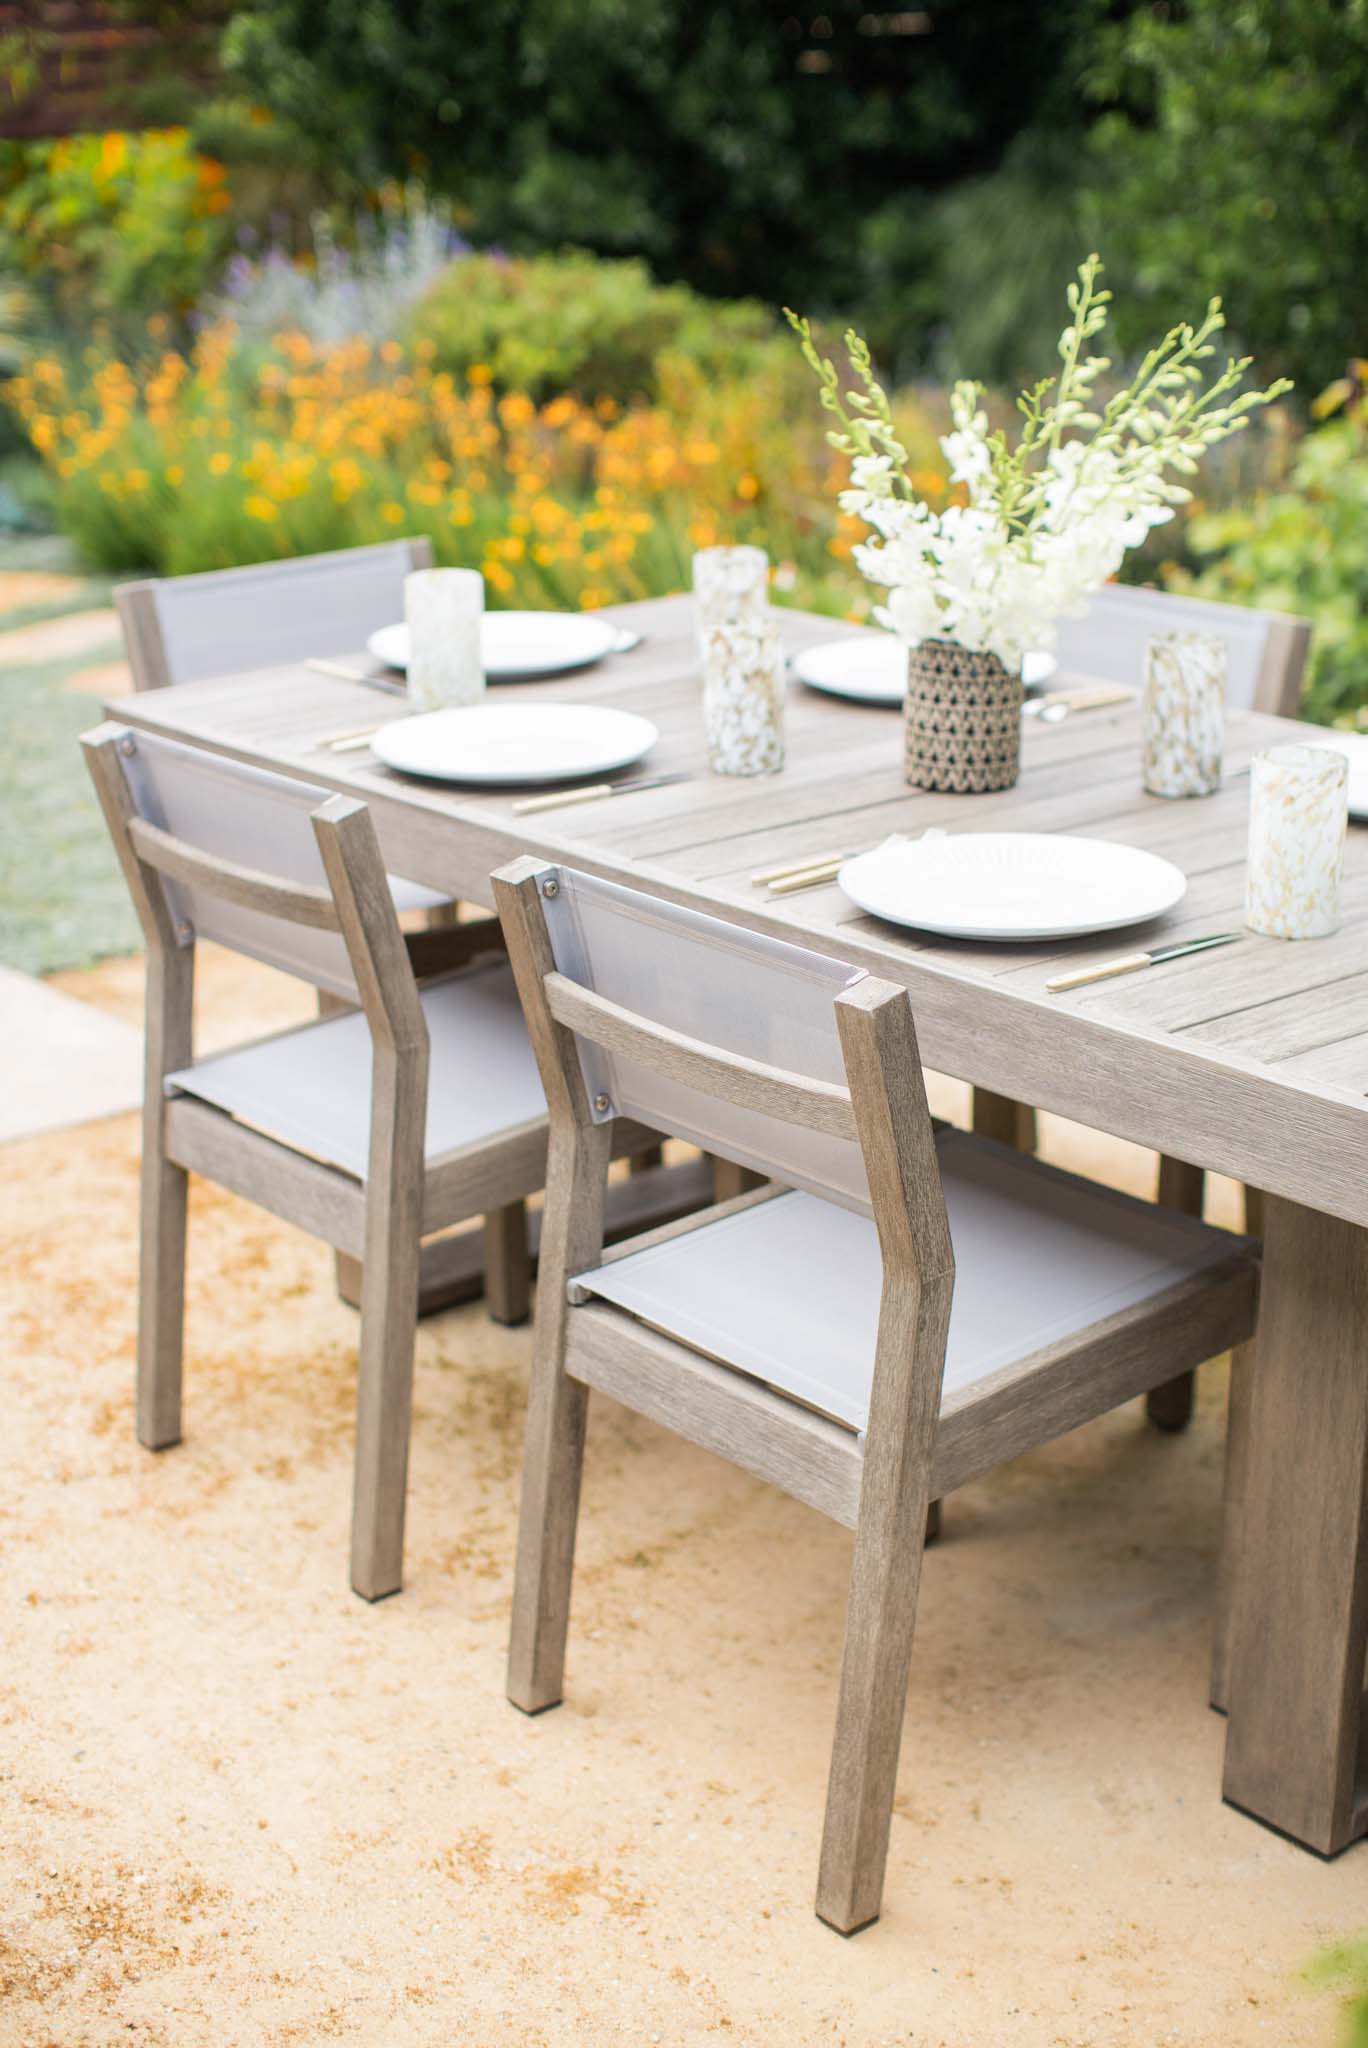 Jodi G Designs | Santa Barbara Interior Design Lanscape -55.jpg